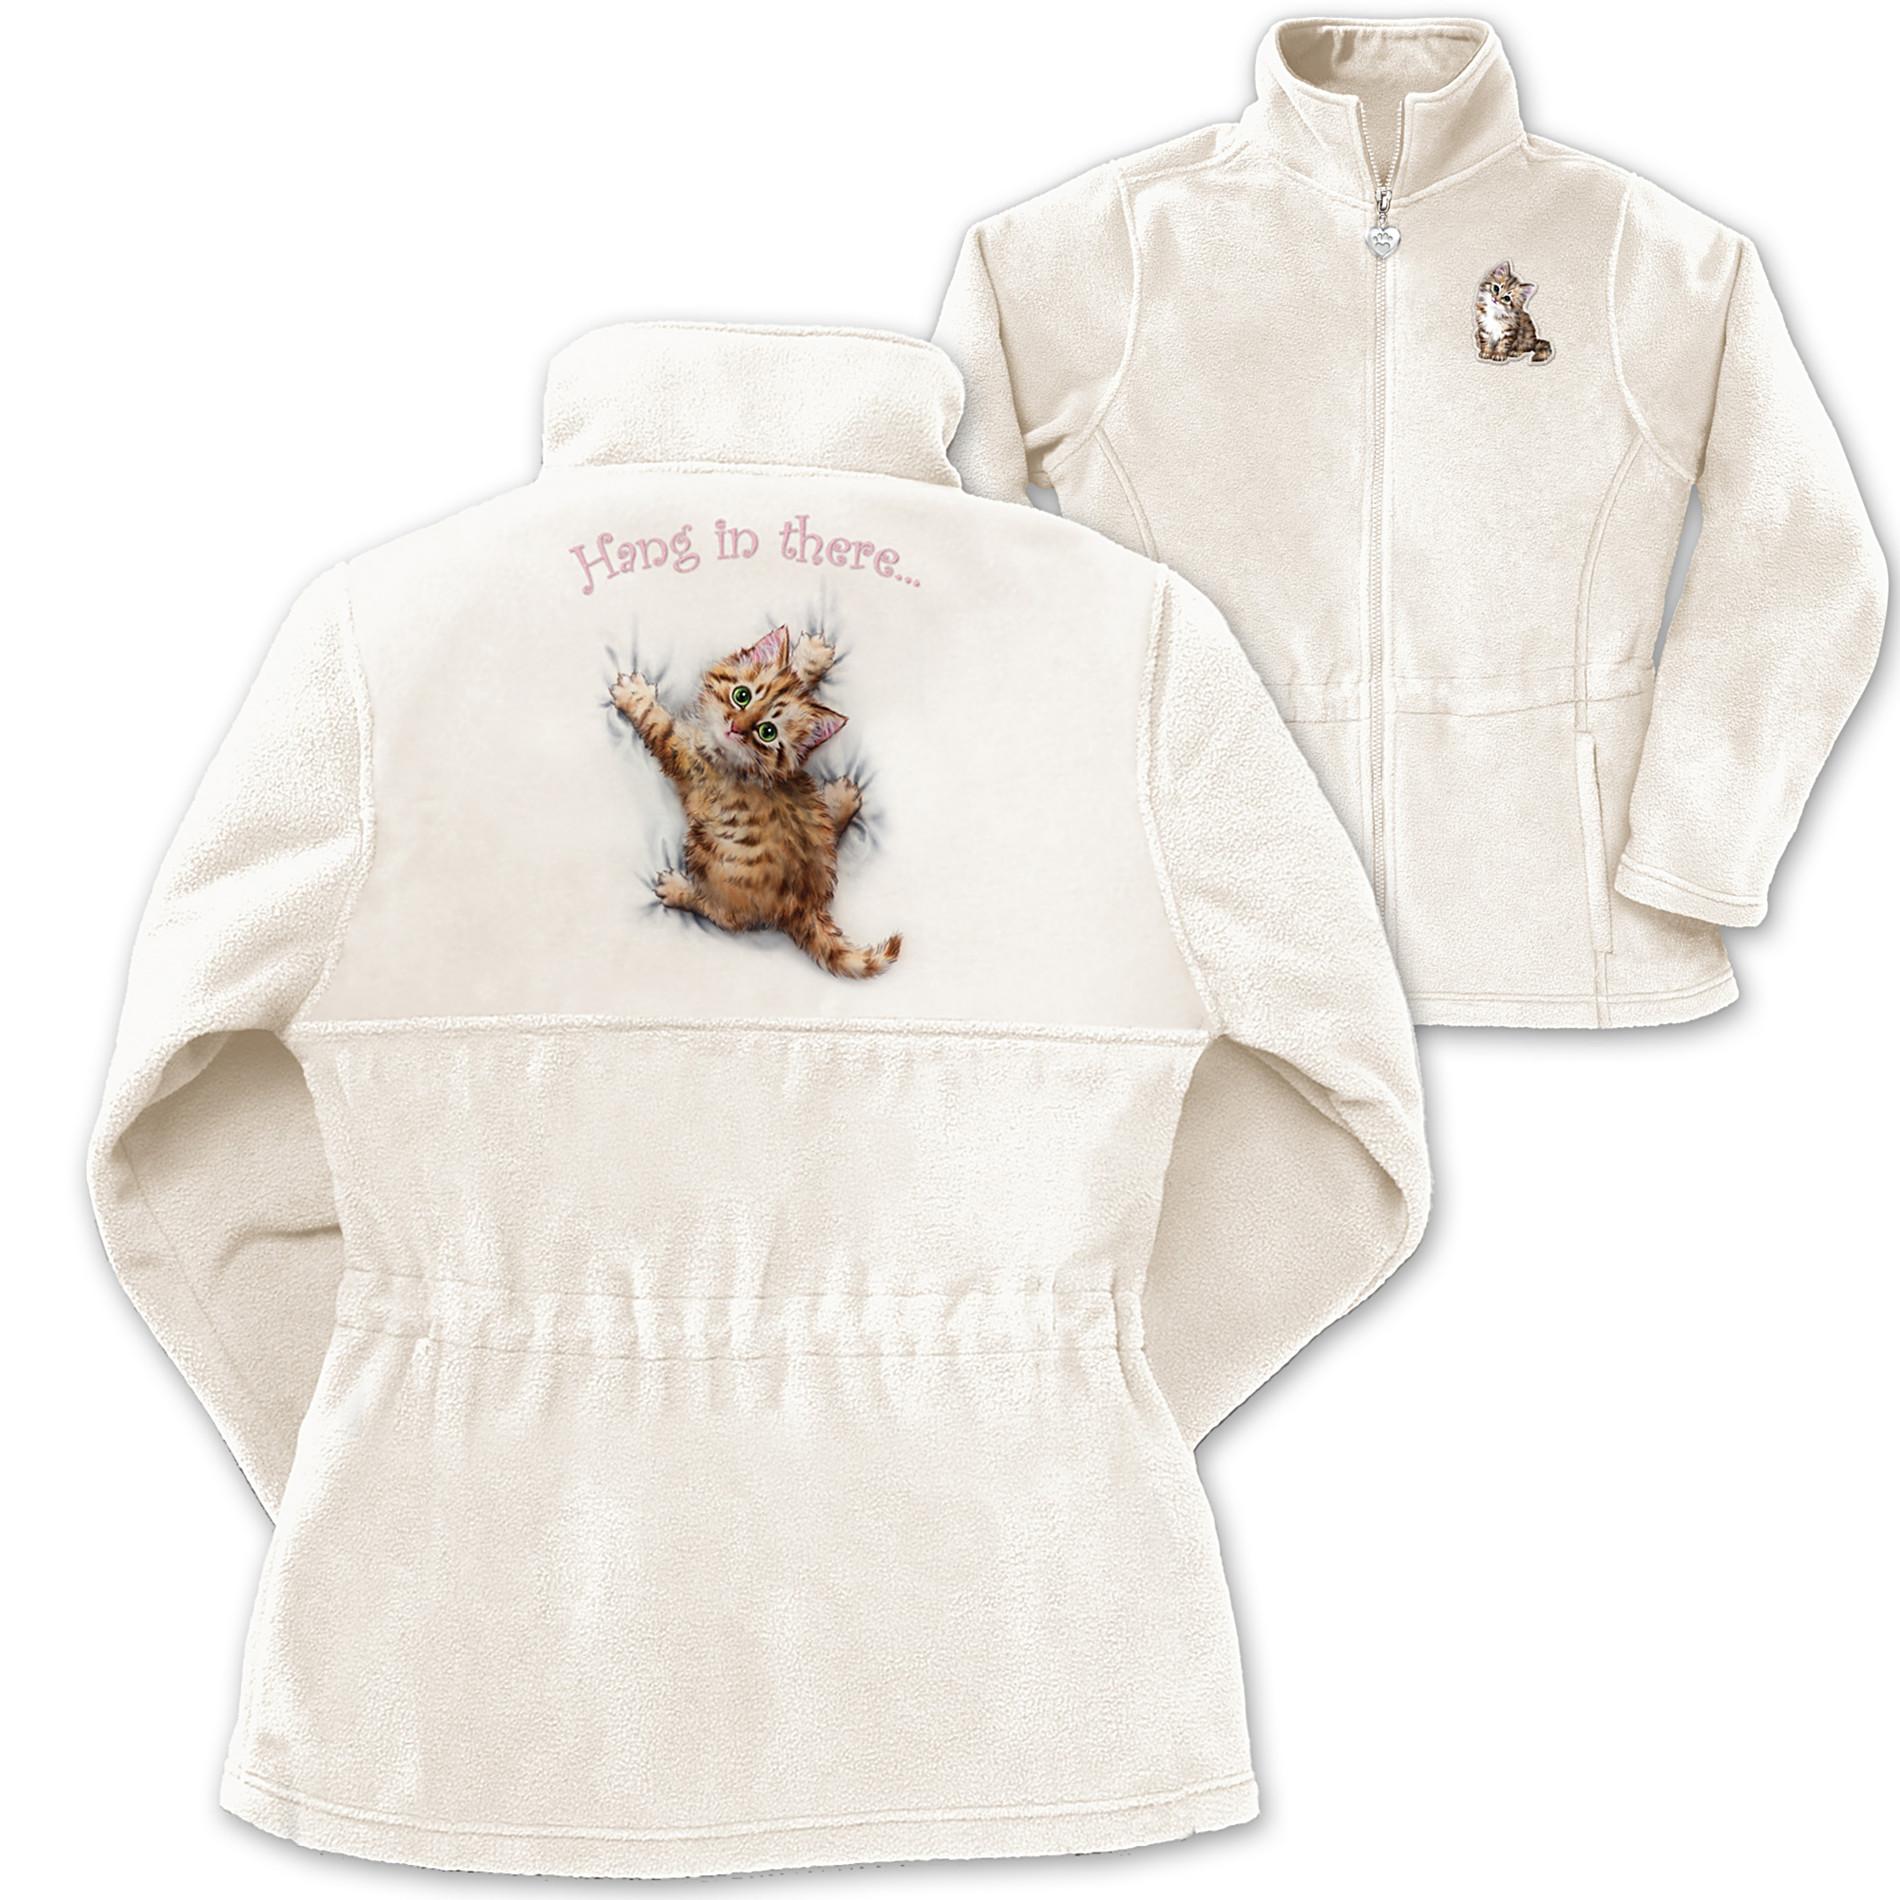 The Bradford Exchange Women's Jacket: Kitten Kutie Women's Jacket at Sears.com